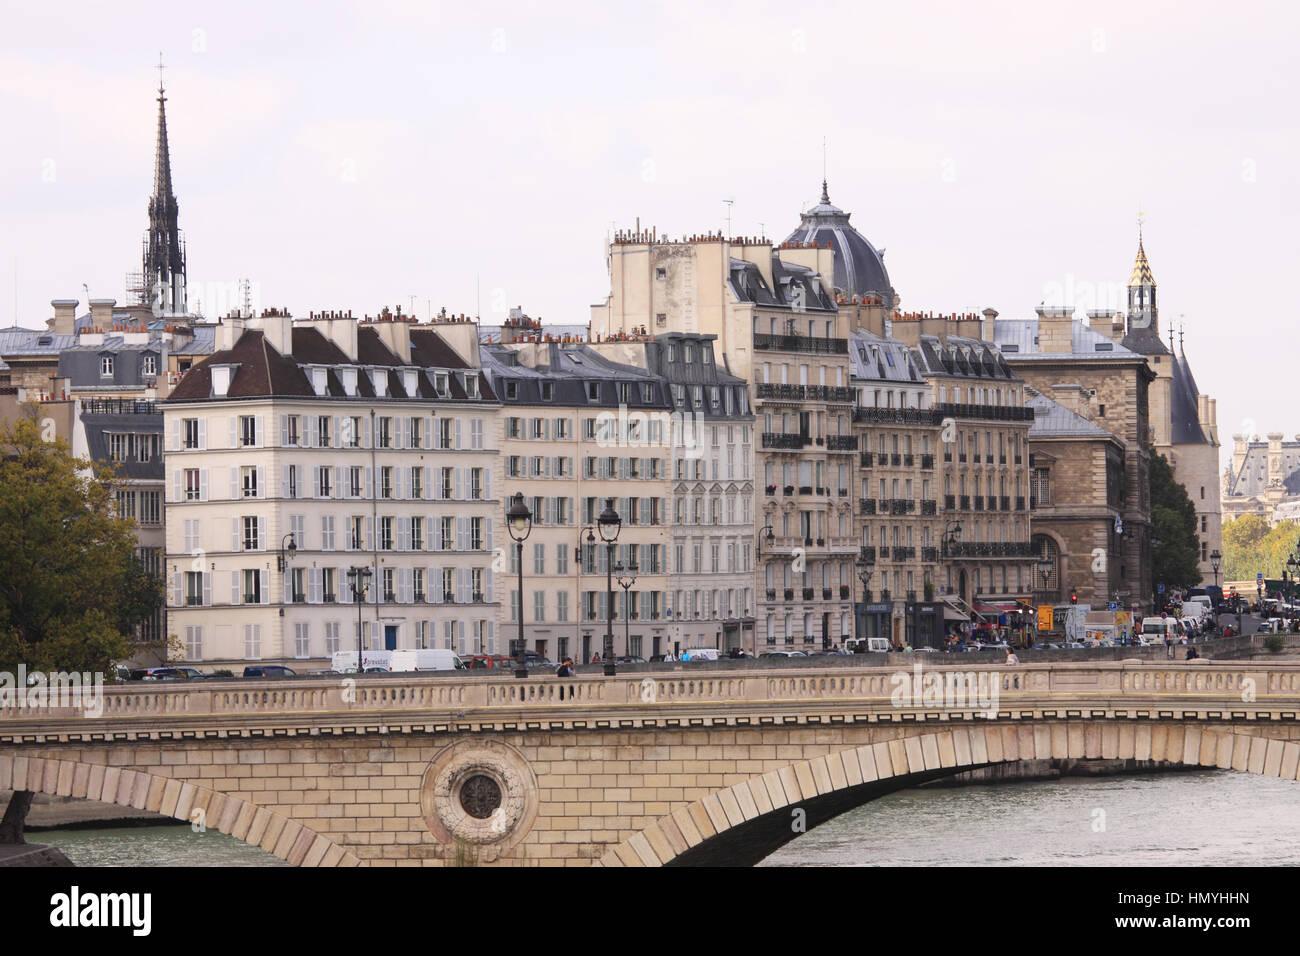 Pont Louis-Philippe crossing over River Seine in Paris - Stock Image